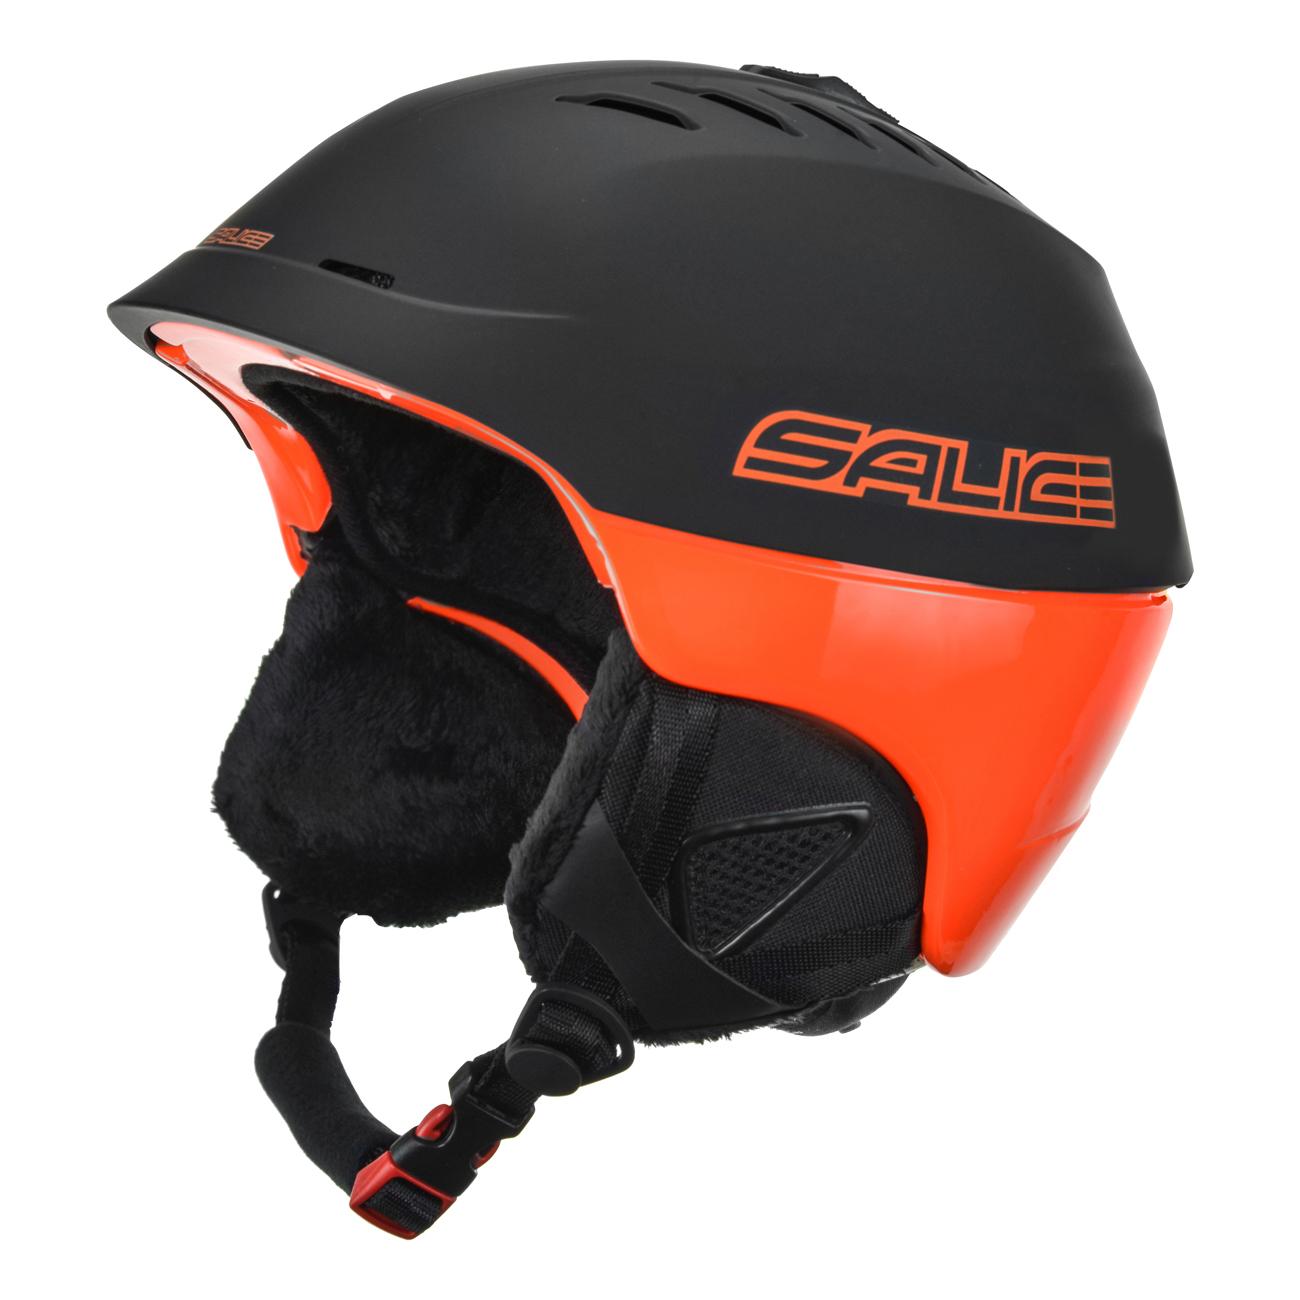 Зимний Шлем Salice 2016-17 Xtreme Black